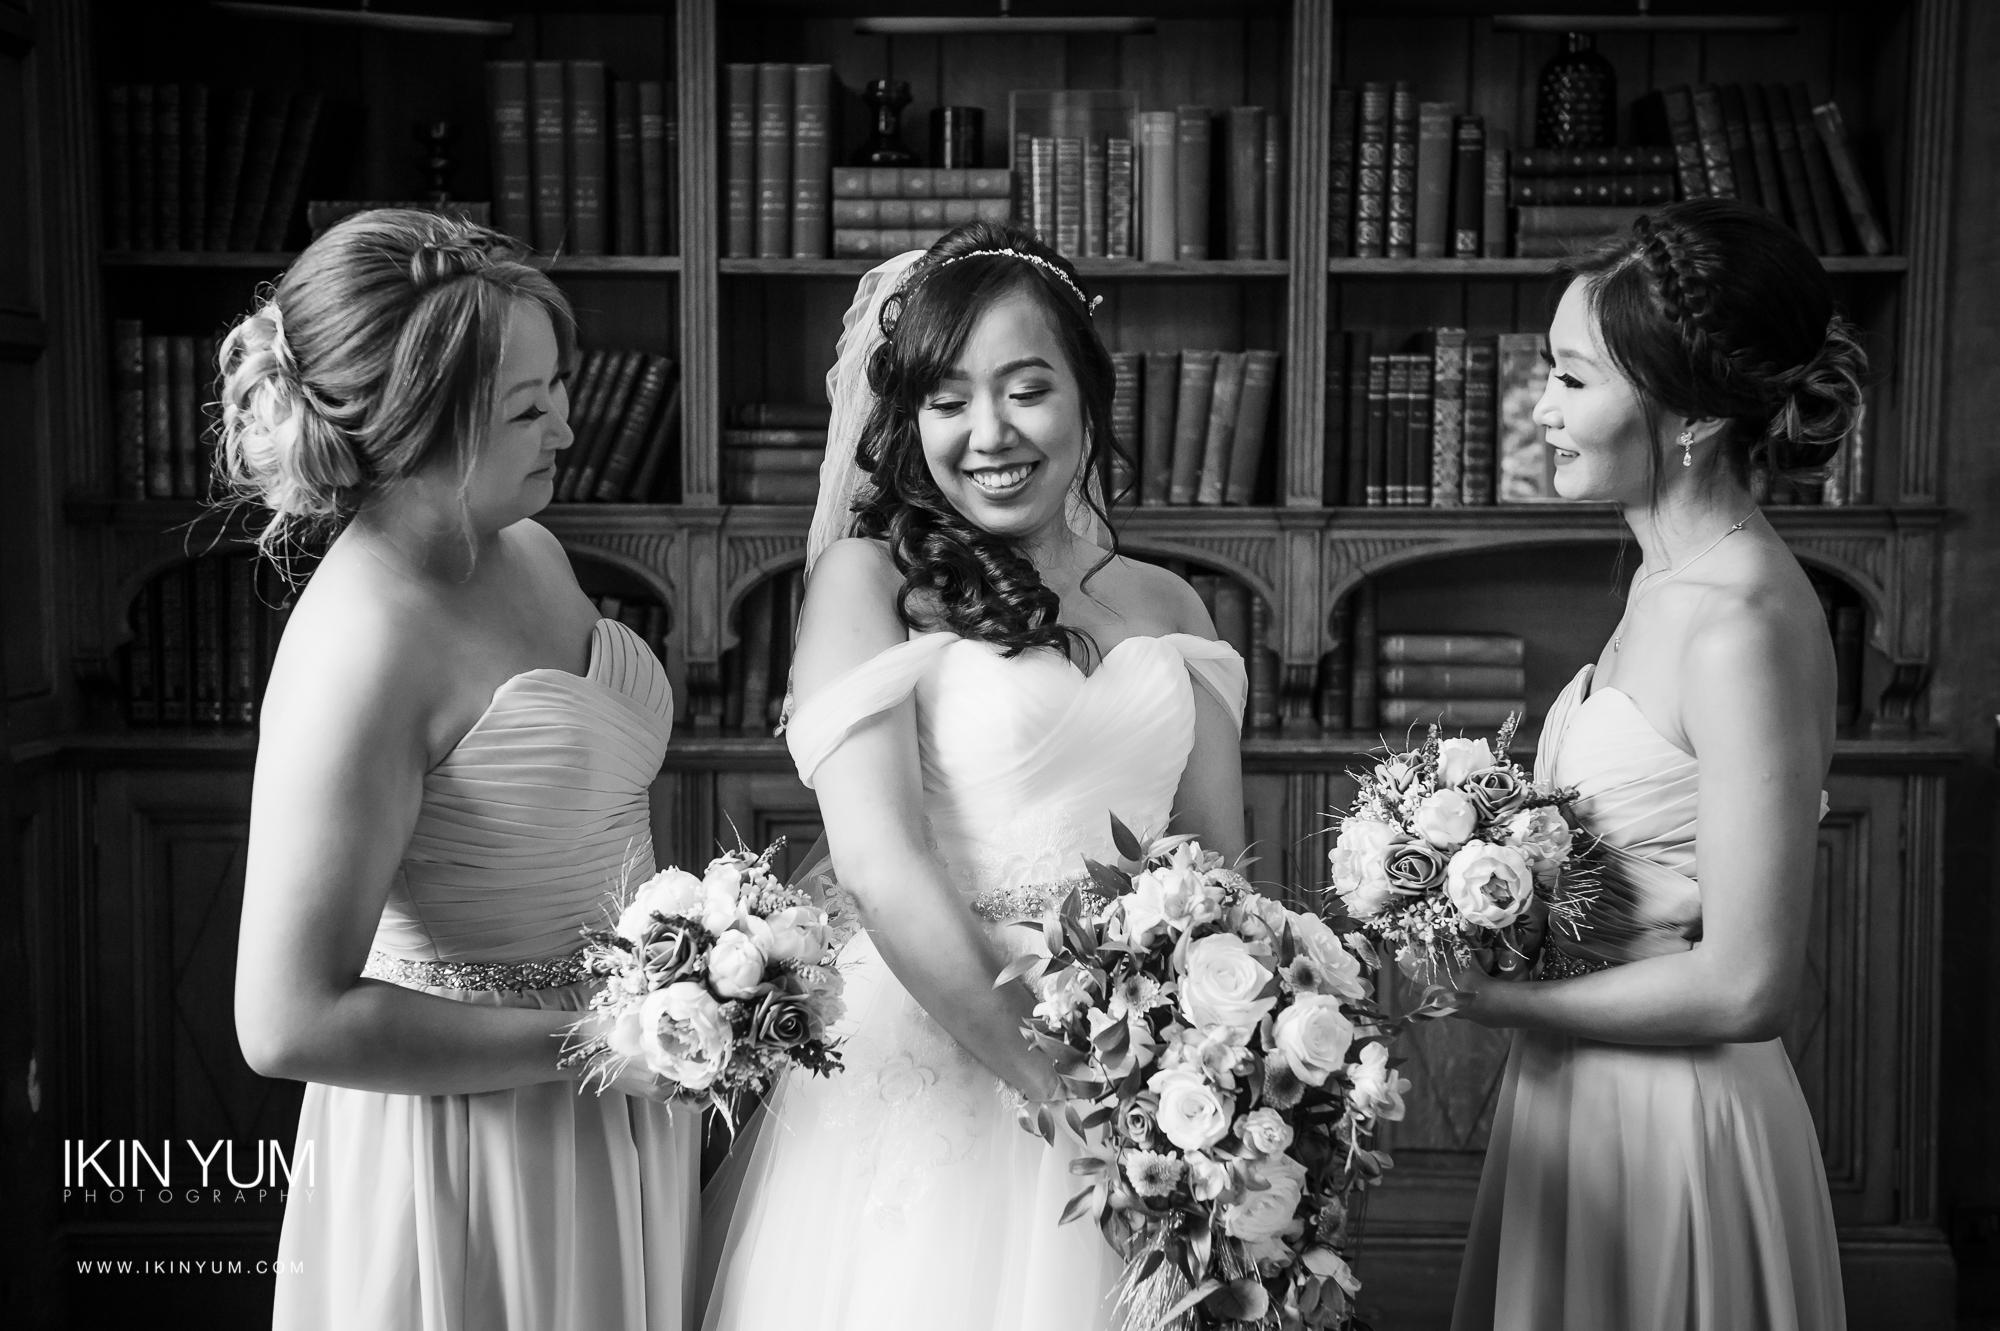 Hampton Manor Wedding - Ikin Yum Photography -061.jpg